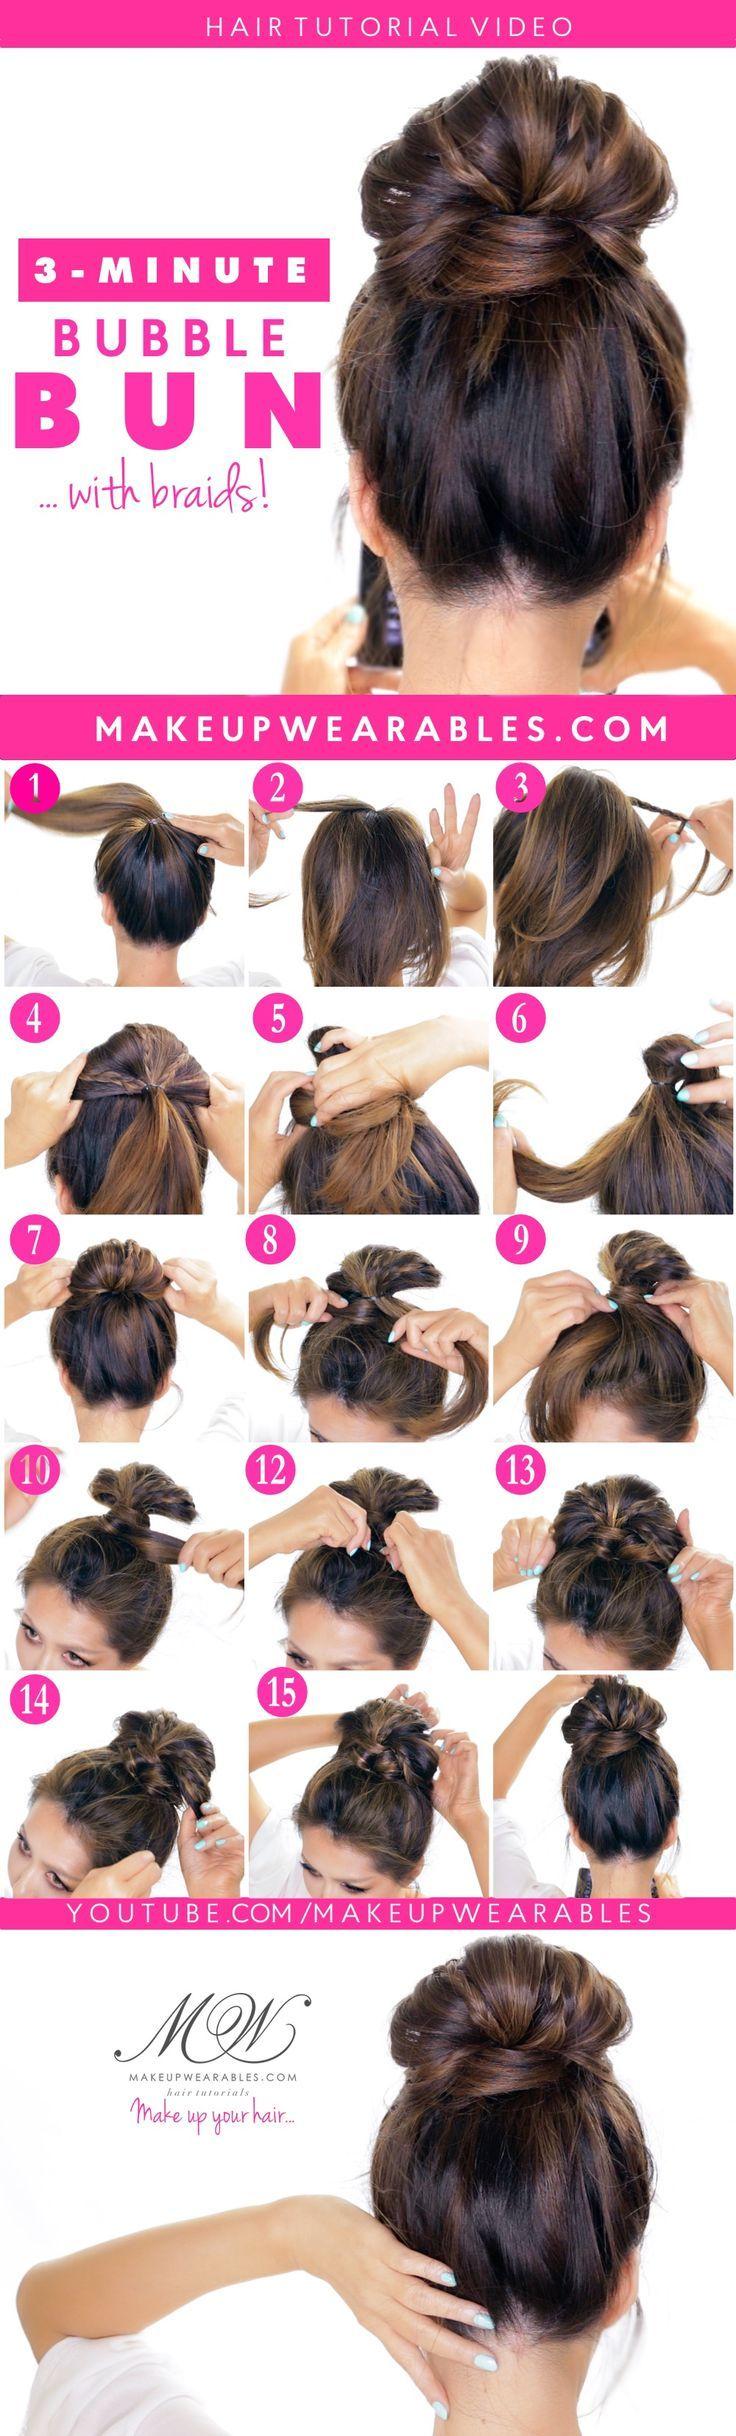 Wondrous 1000 Ideas About Lazy Day Hairstyles On Pinterest Full Ponytail Short Hairstyles Gunalazisus